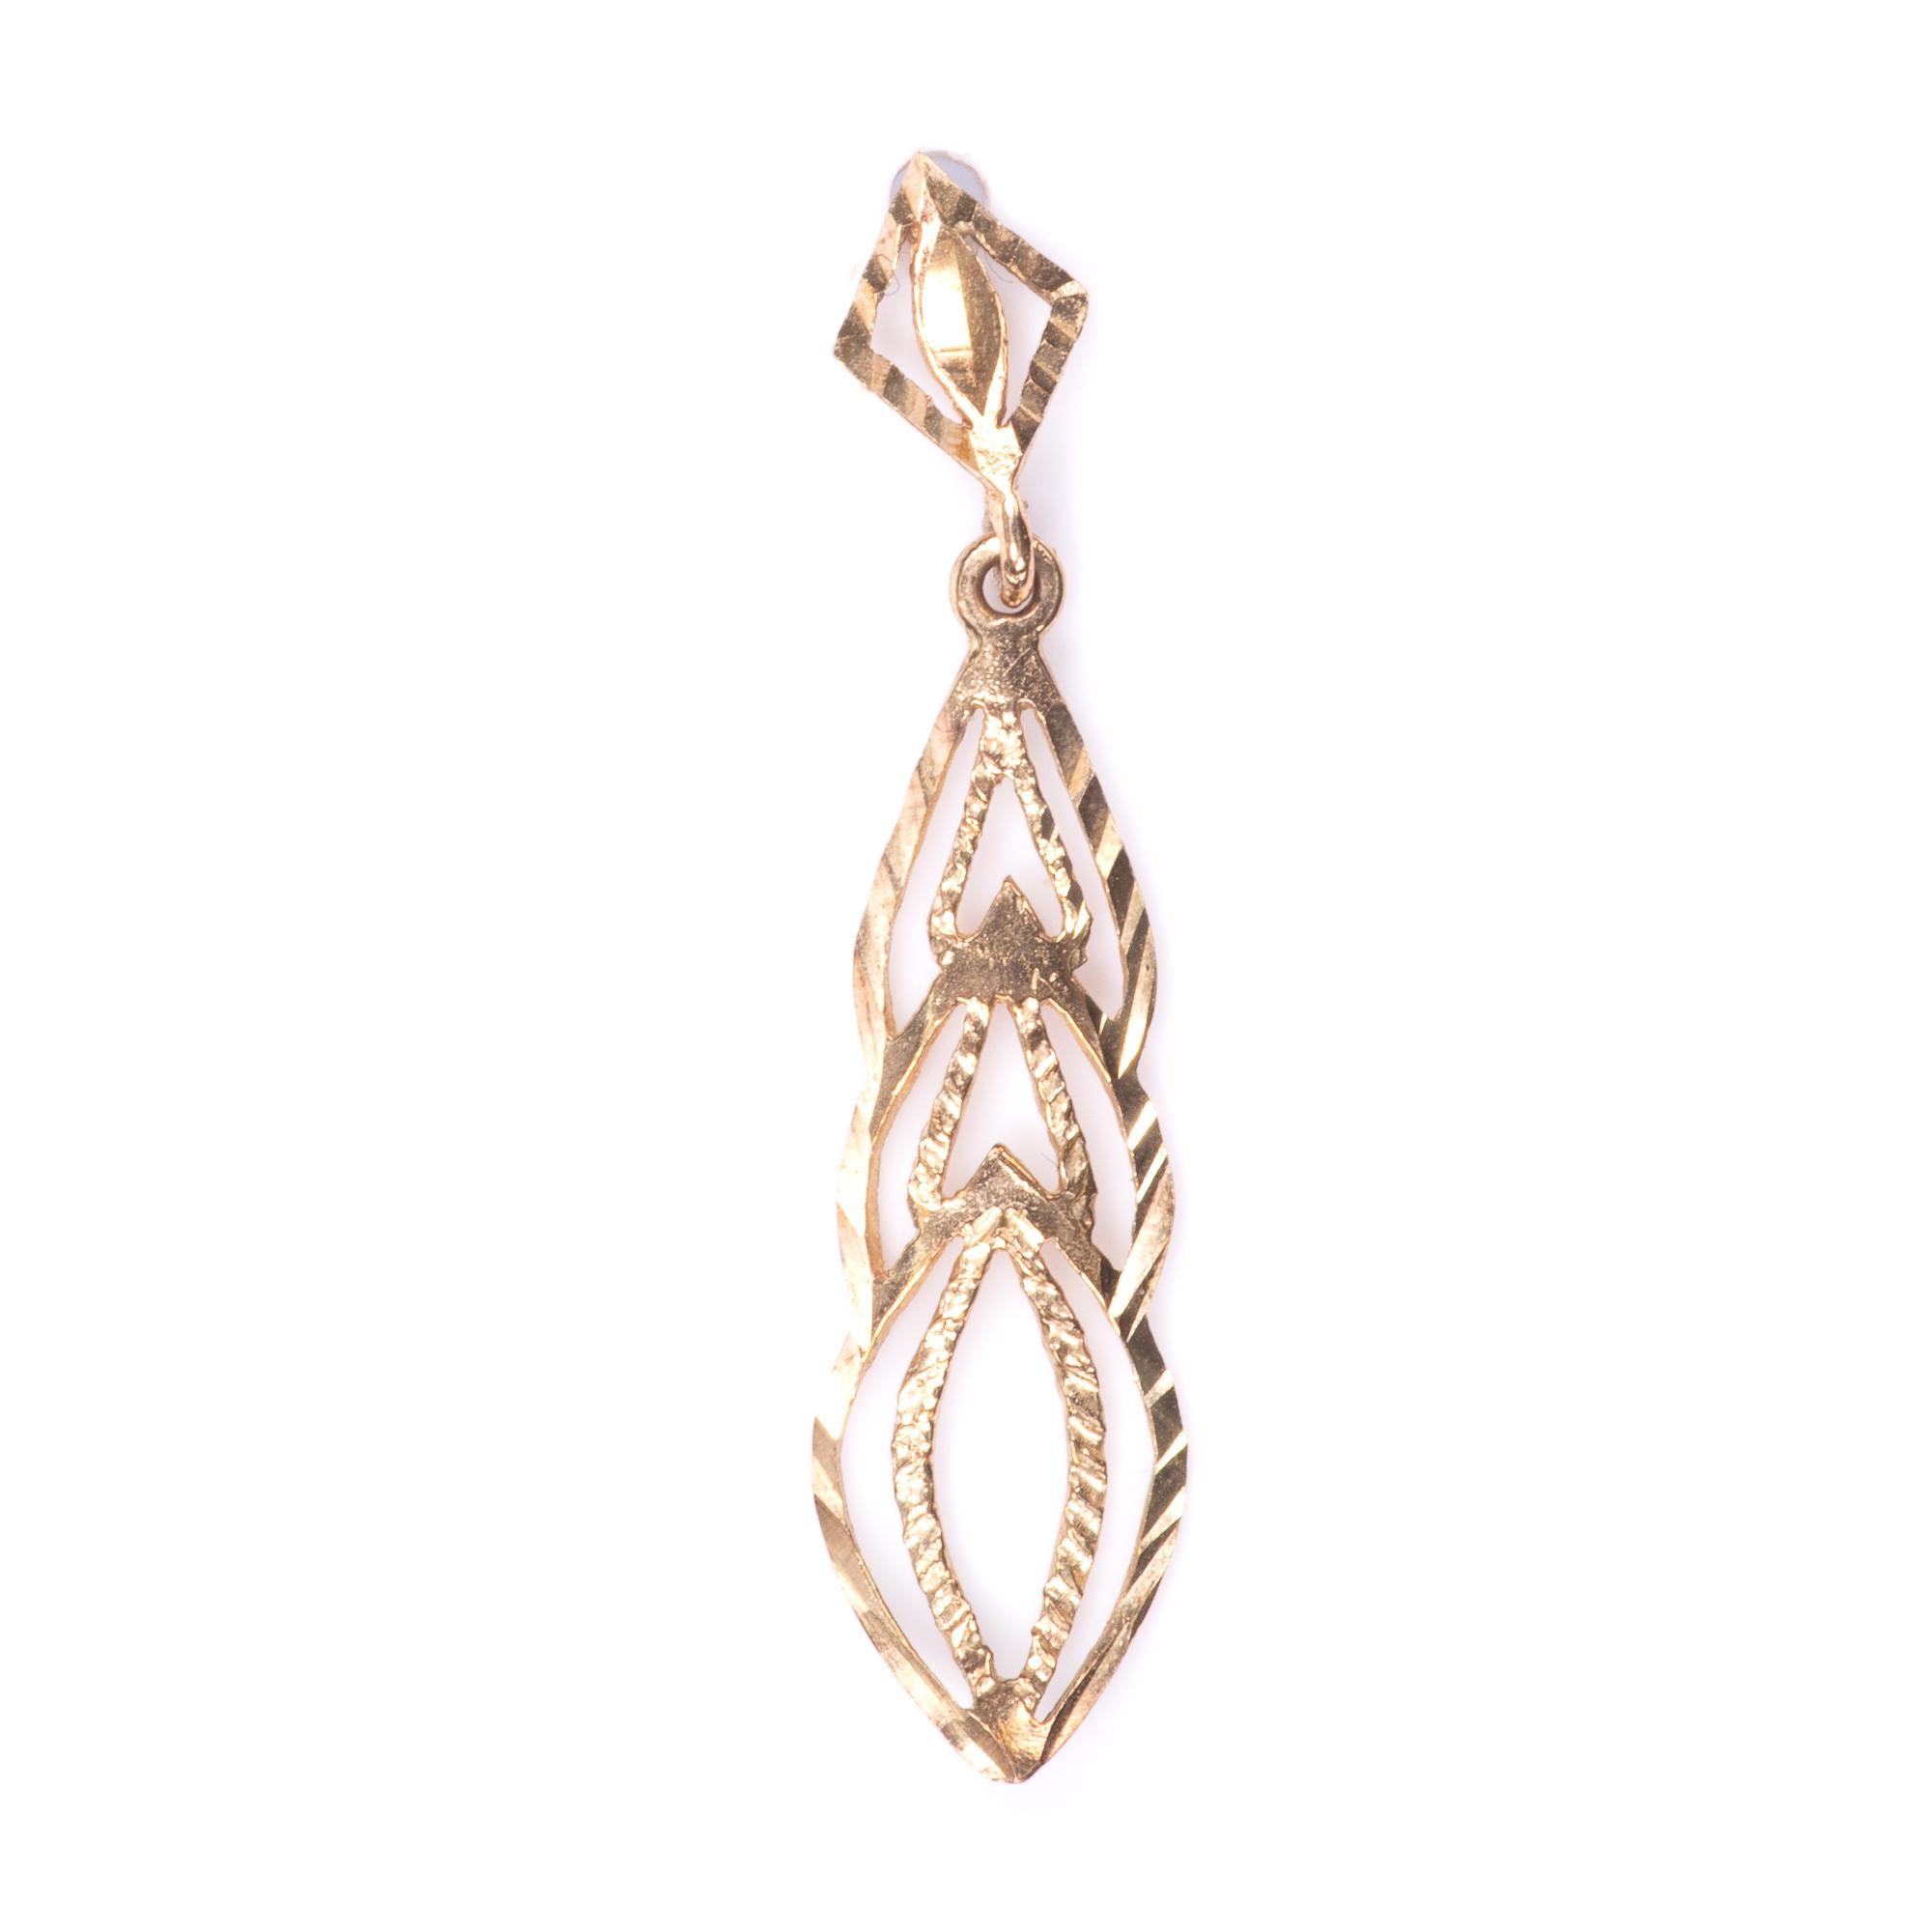 9ct Gold Filigree Earrings - Image 5 of 7